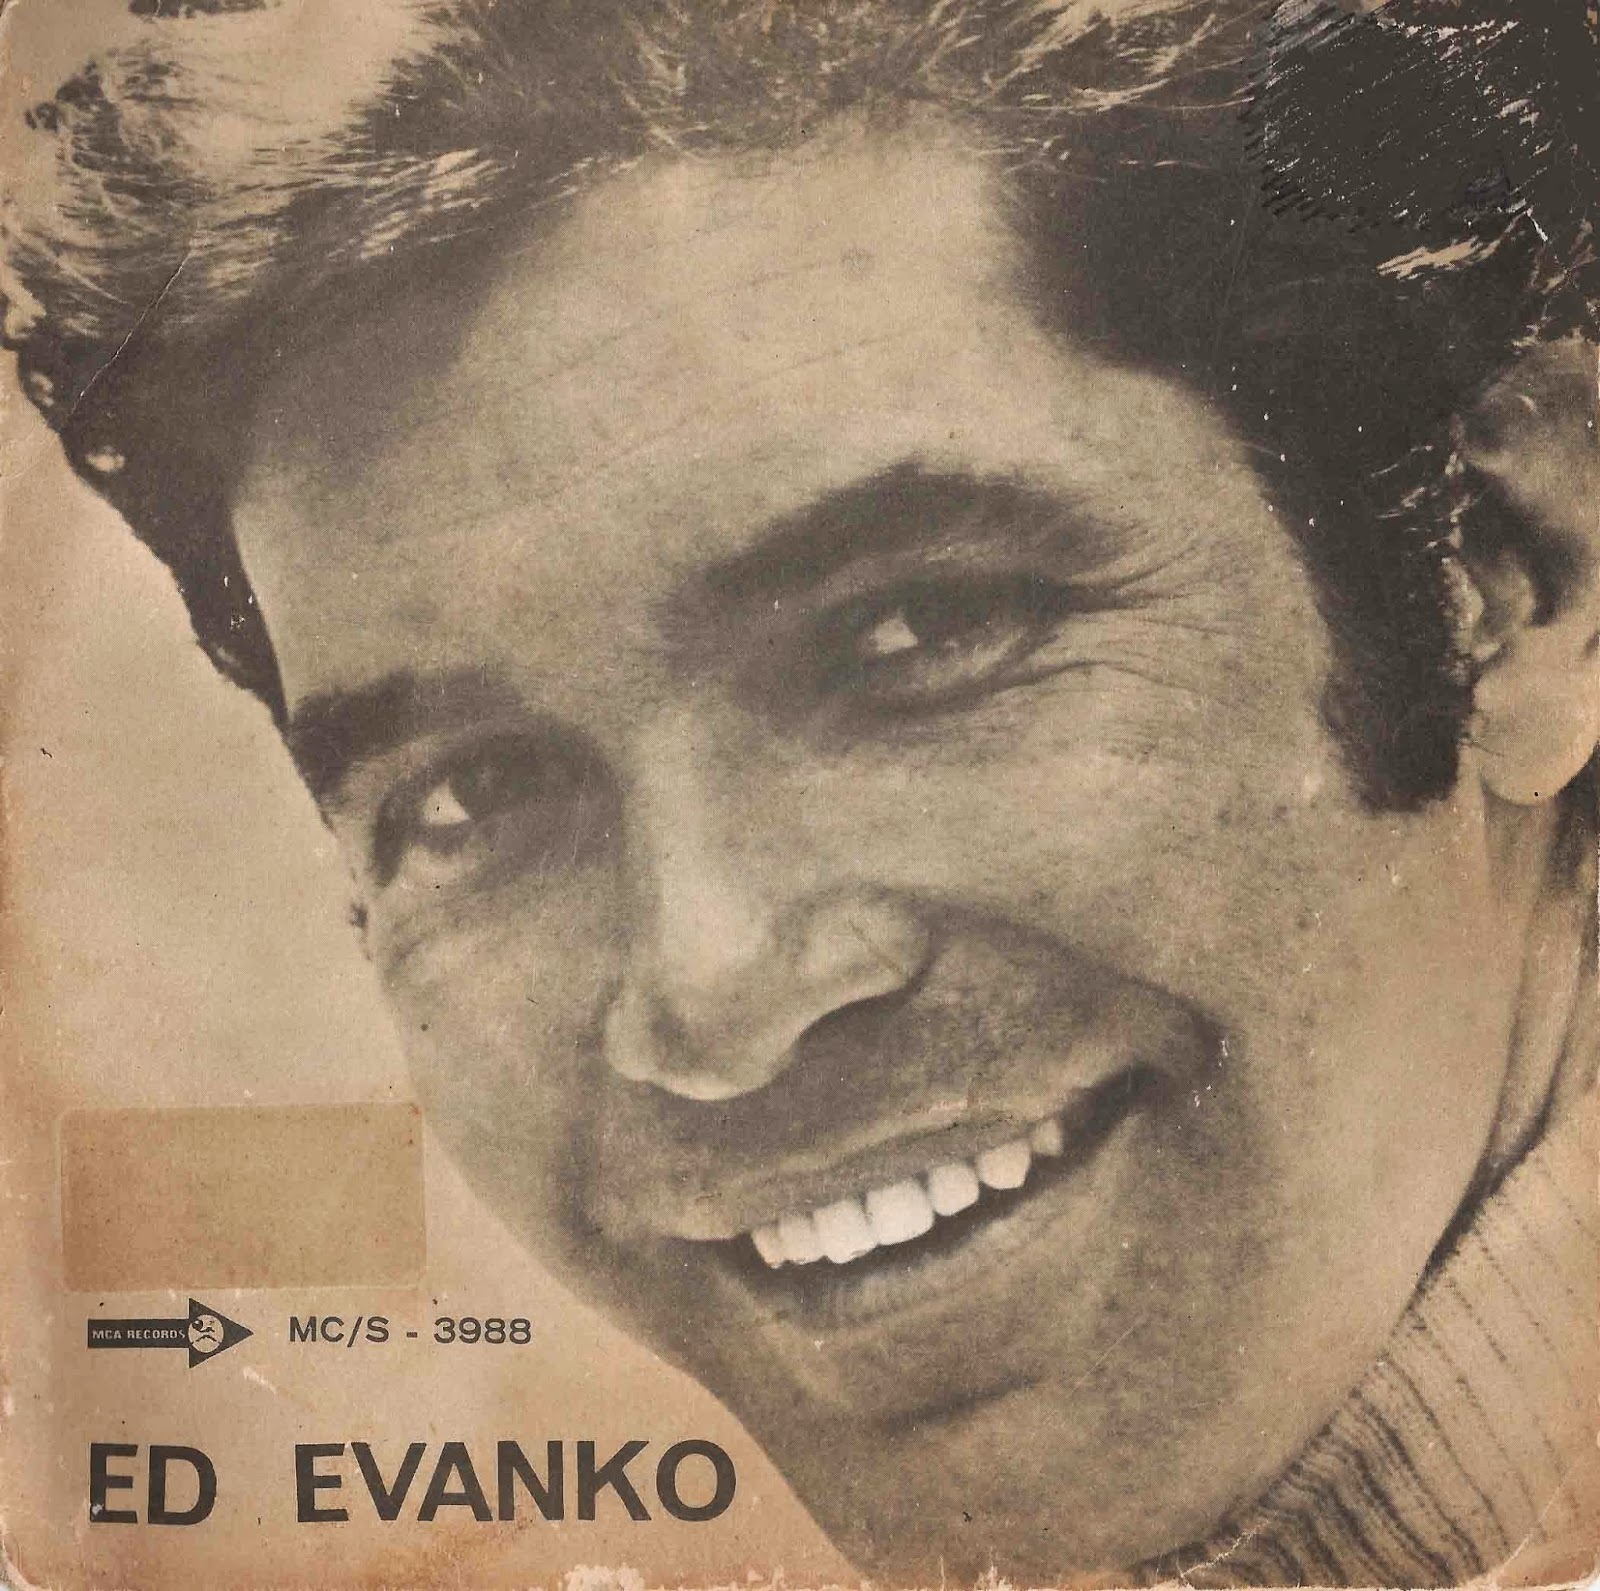 Ed Evanko - Let her go_capinha